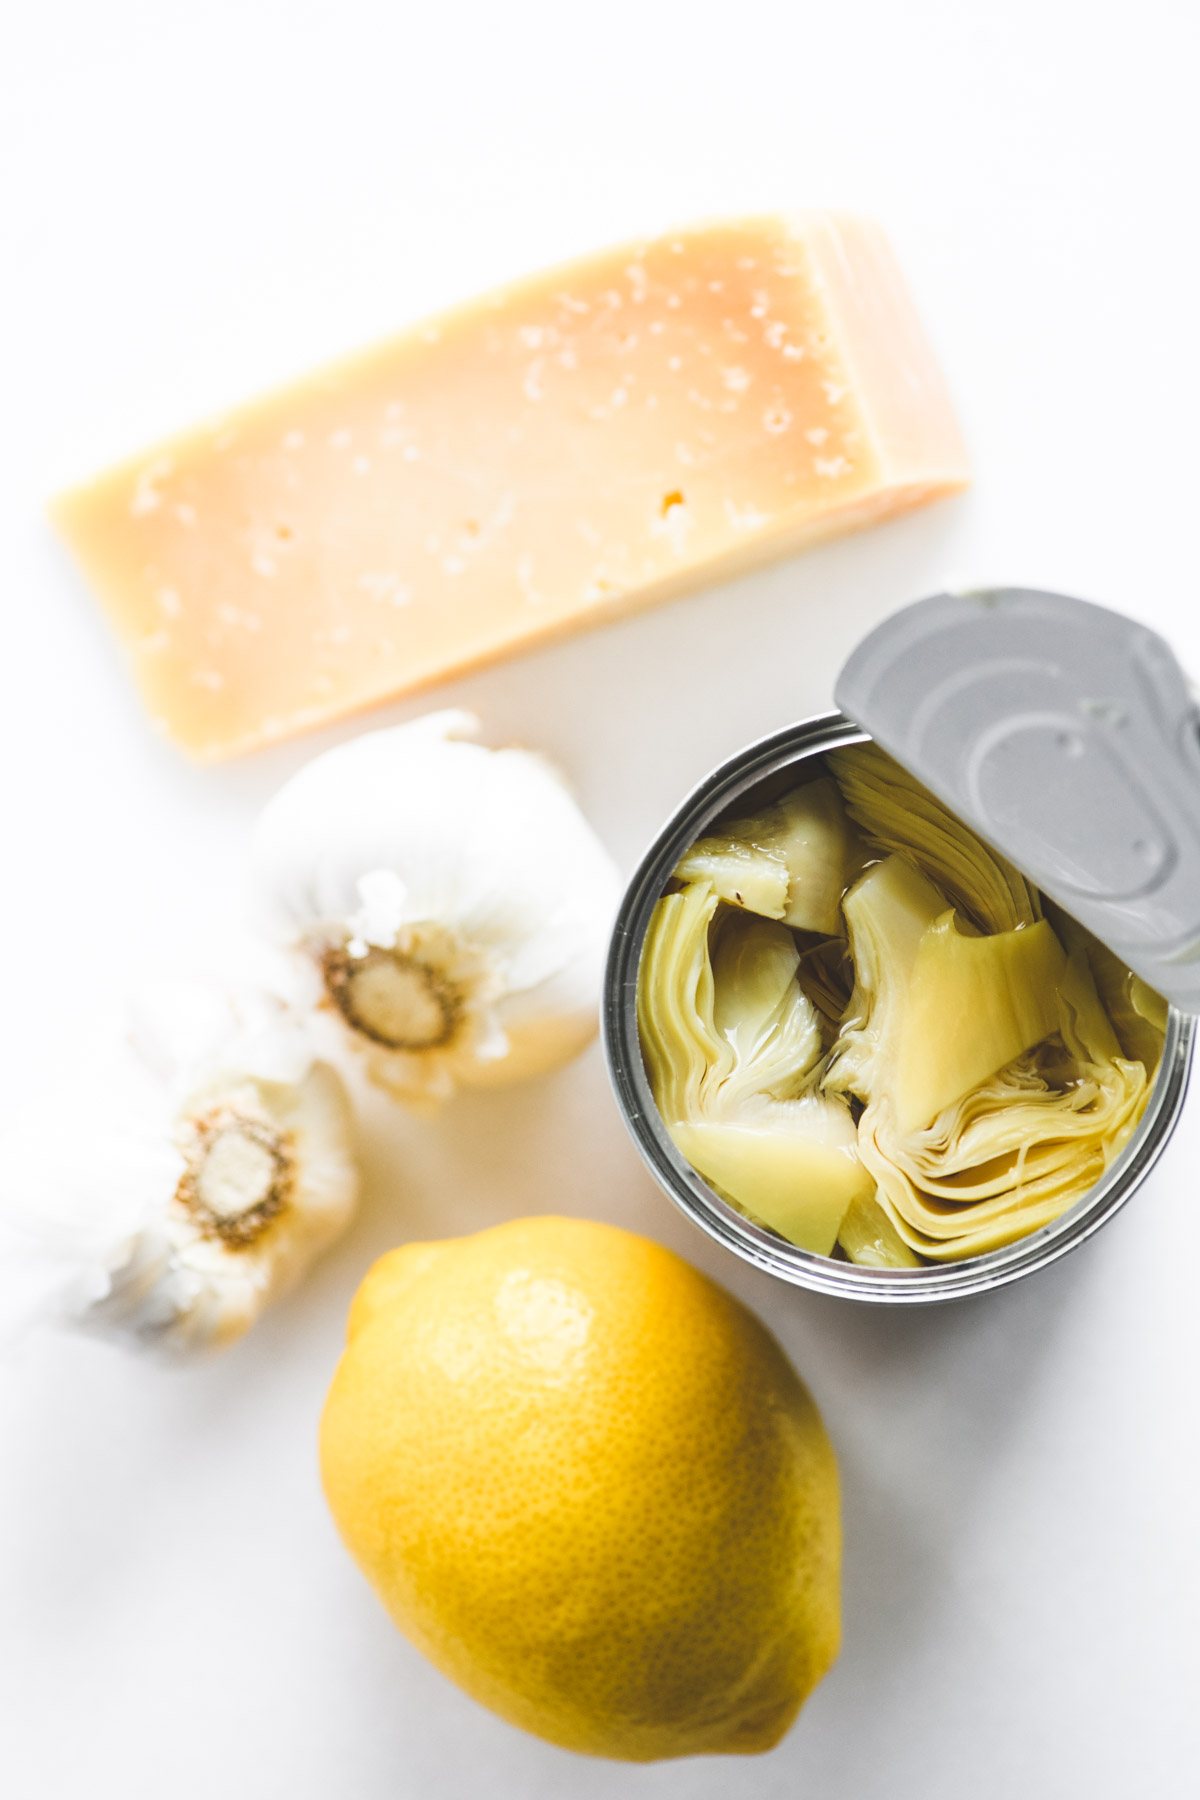 ingredients for lemon artichoke pesto